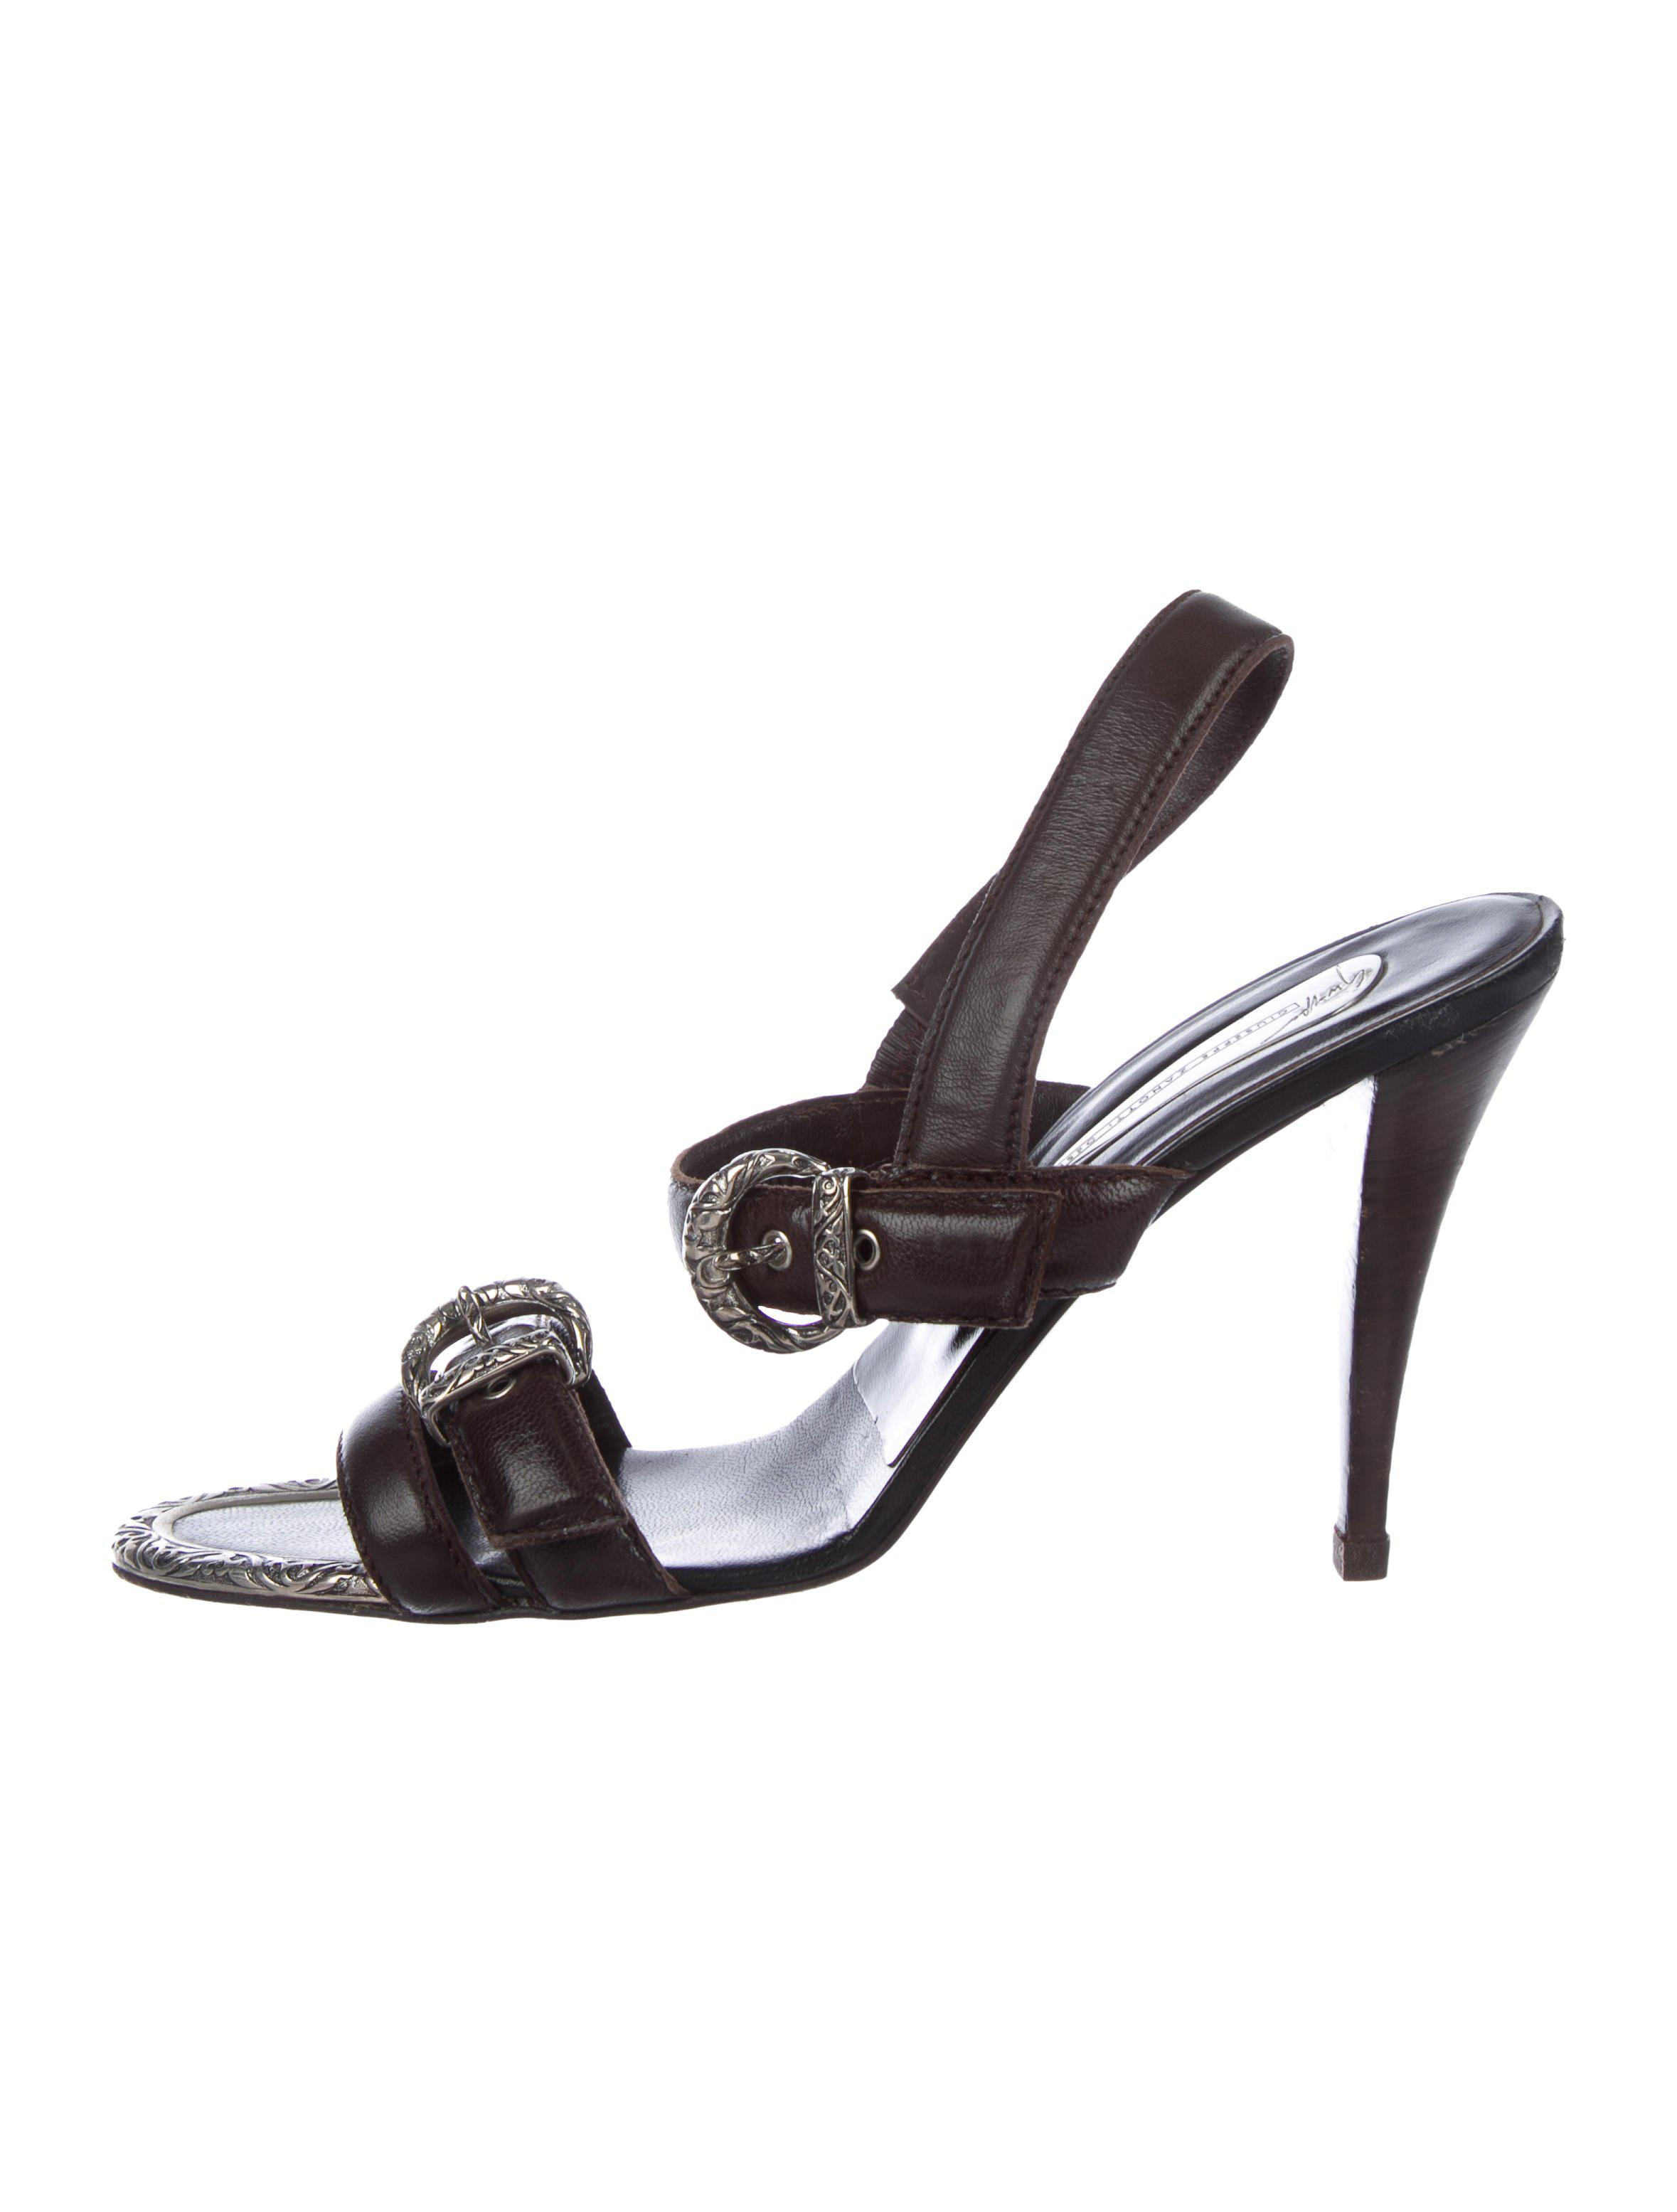 71078a42b8afa2 Lyst - Giuseppe Zanotti Embellished Leather Sandals Brown in Metallic